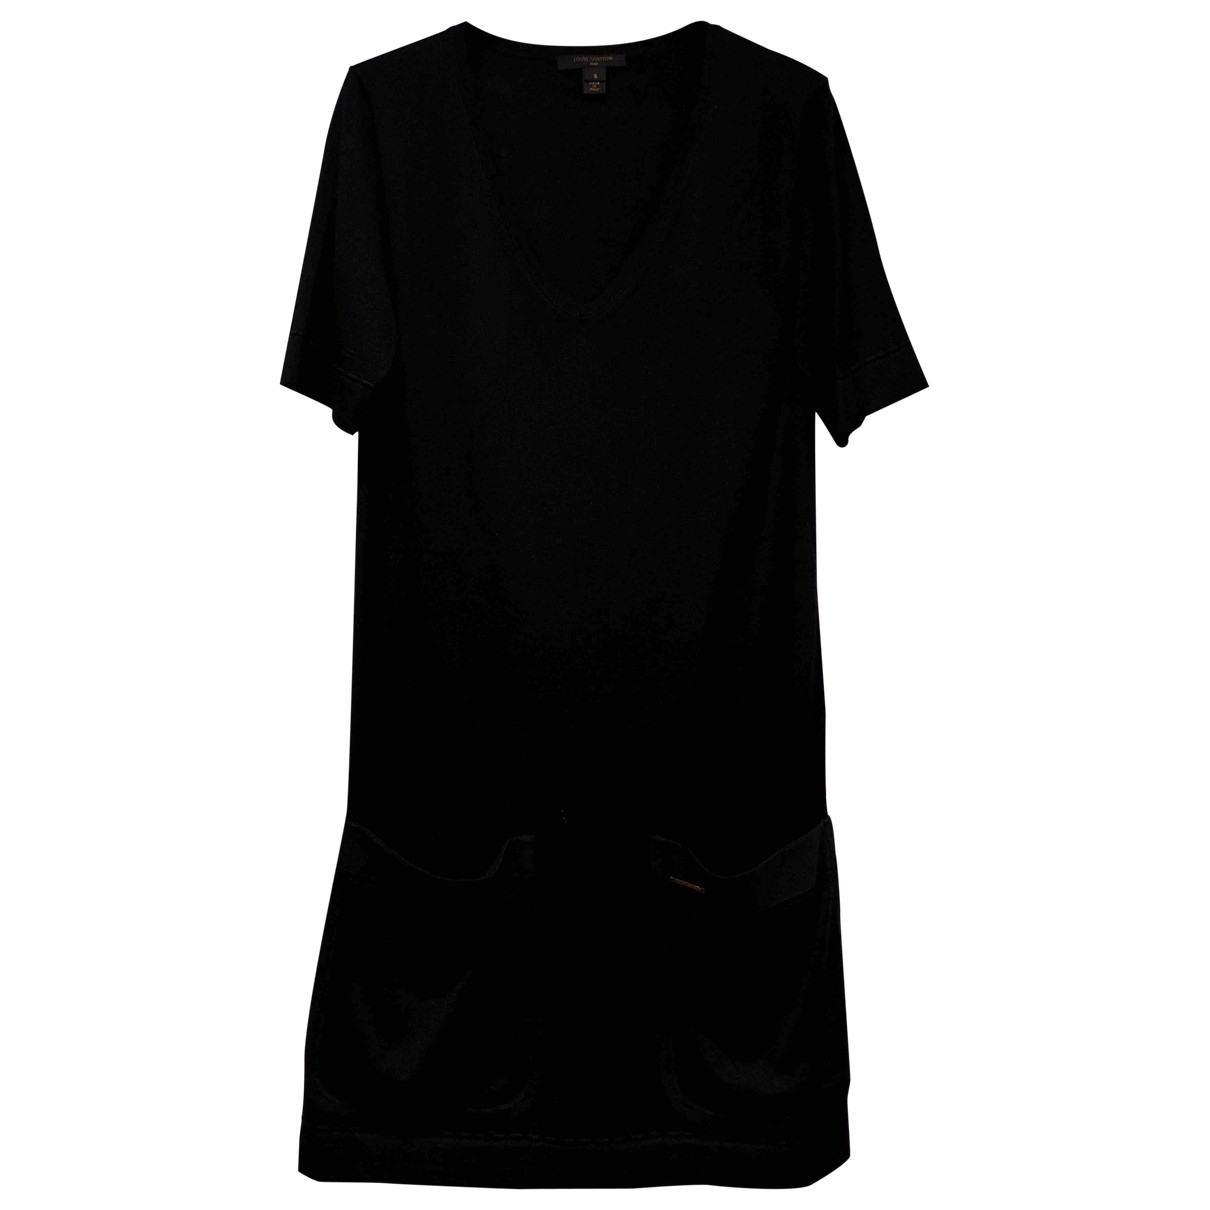 Louis Vuitton \N Black Cashmere dress for Women S International